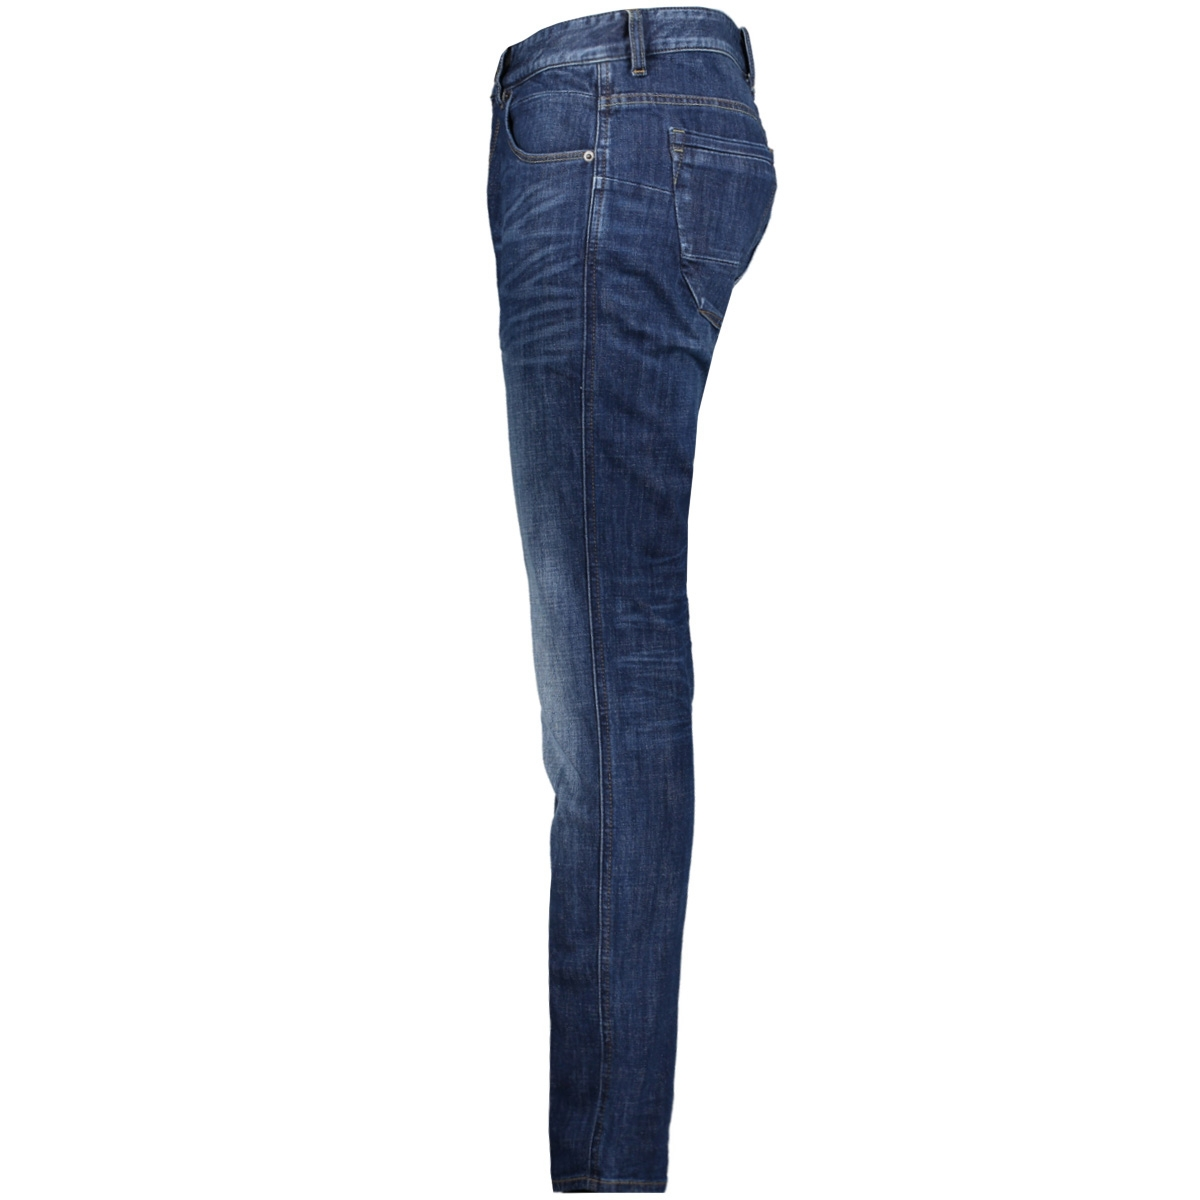 nightflight ptr120 pme legend jeans mvb